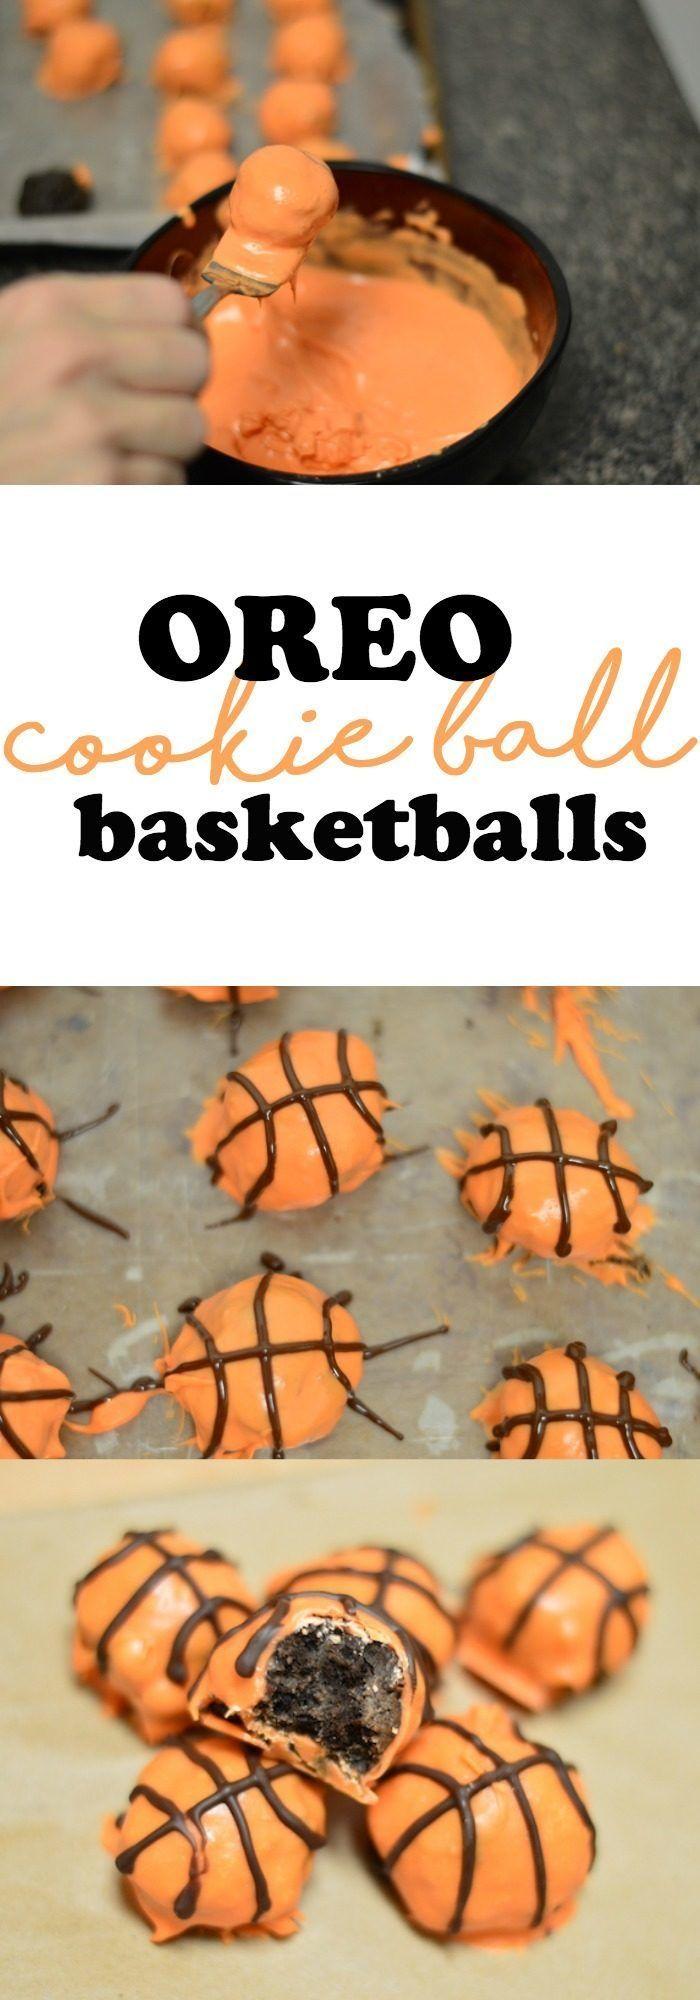 March Basketball Big Tournament Snack: OREO Cookie Ball Basketballs #ad #SnackBracketPlaybook